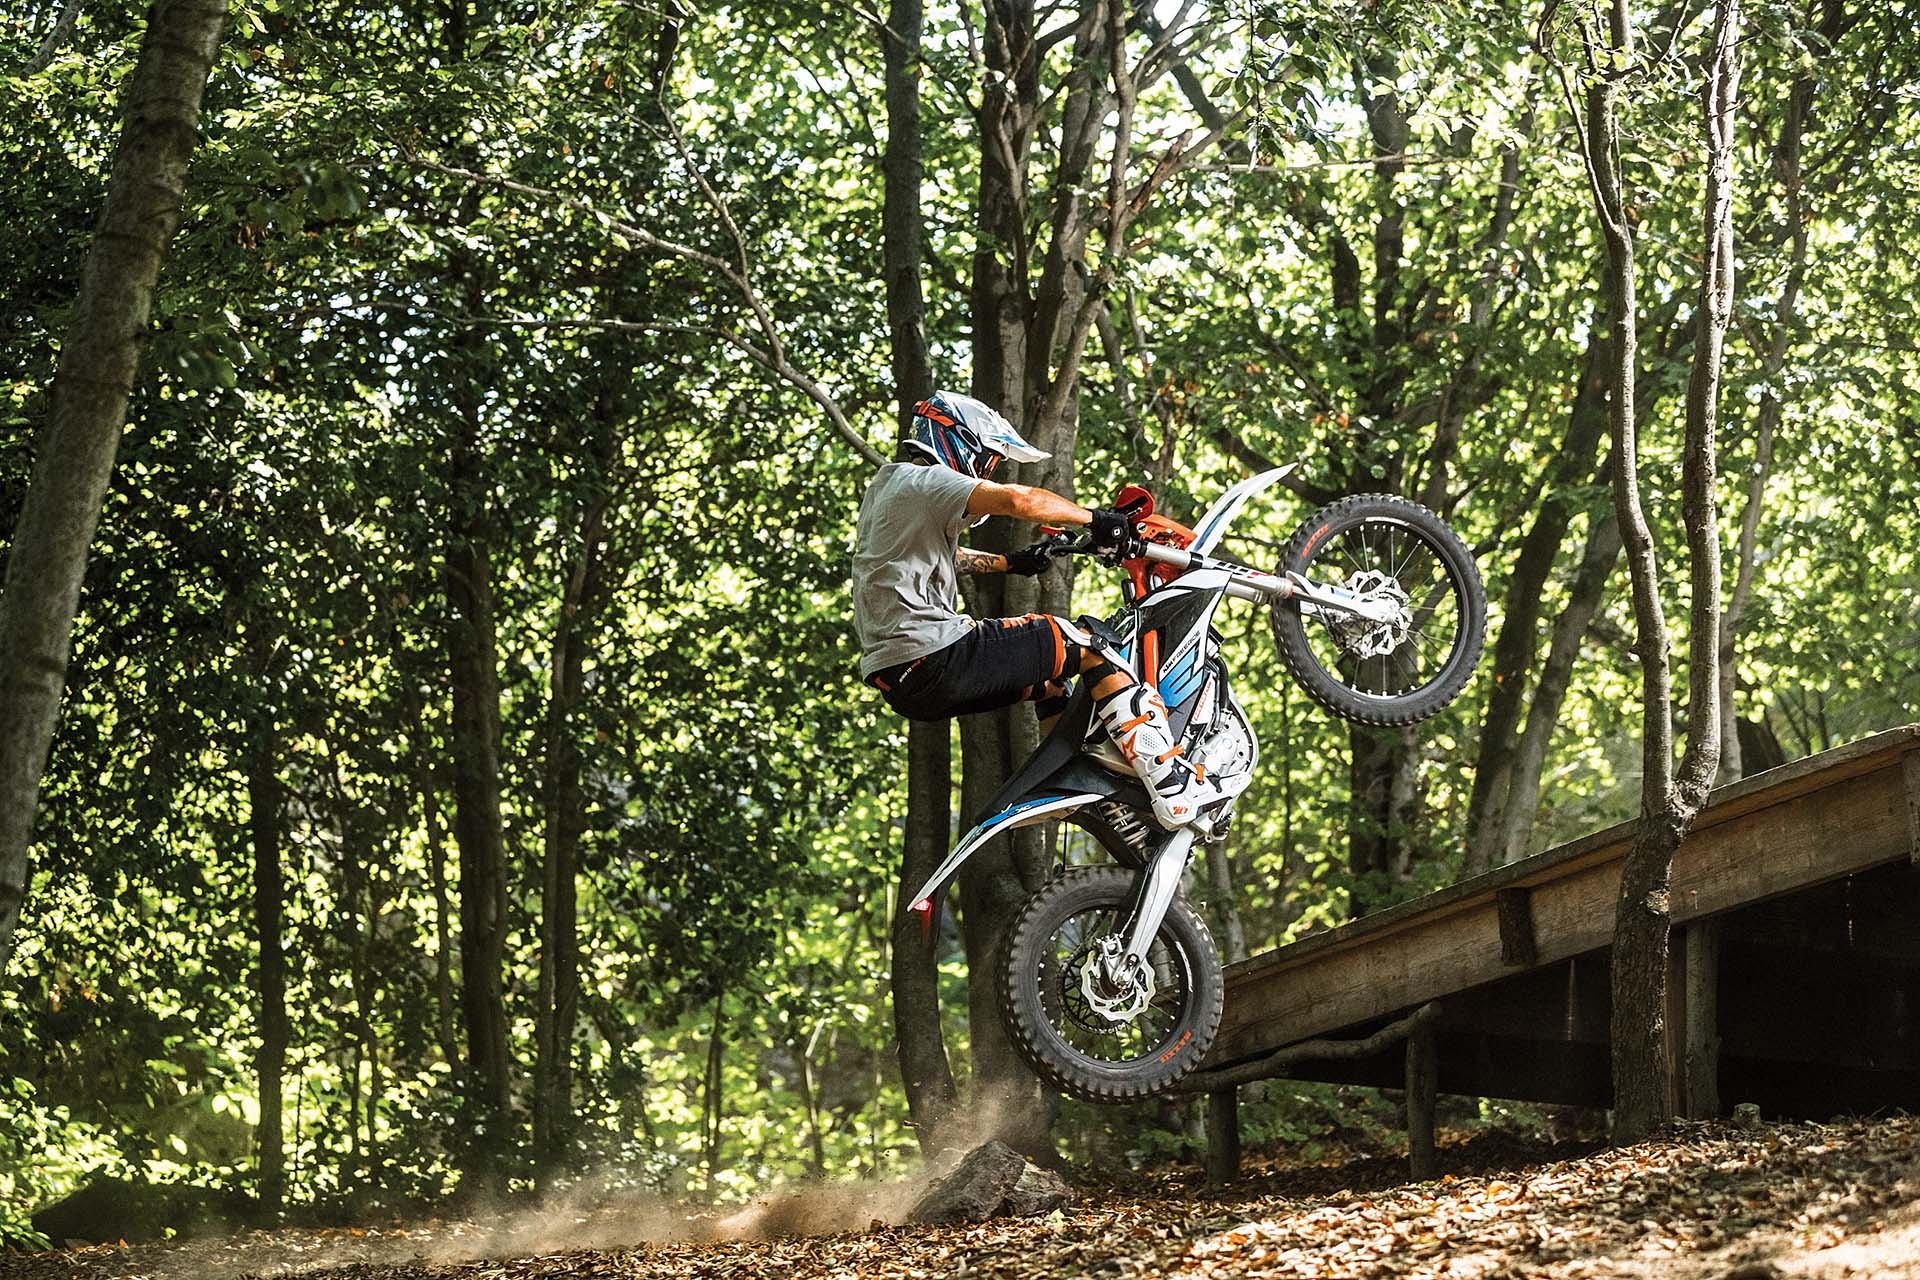 KTM Freeride E-XC - salto